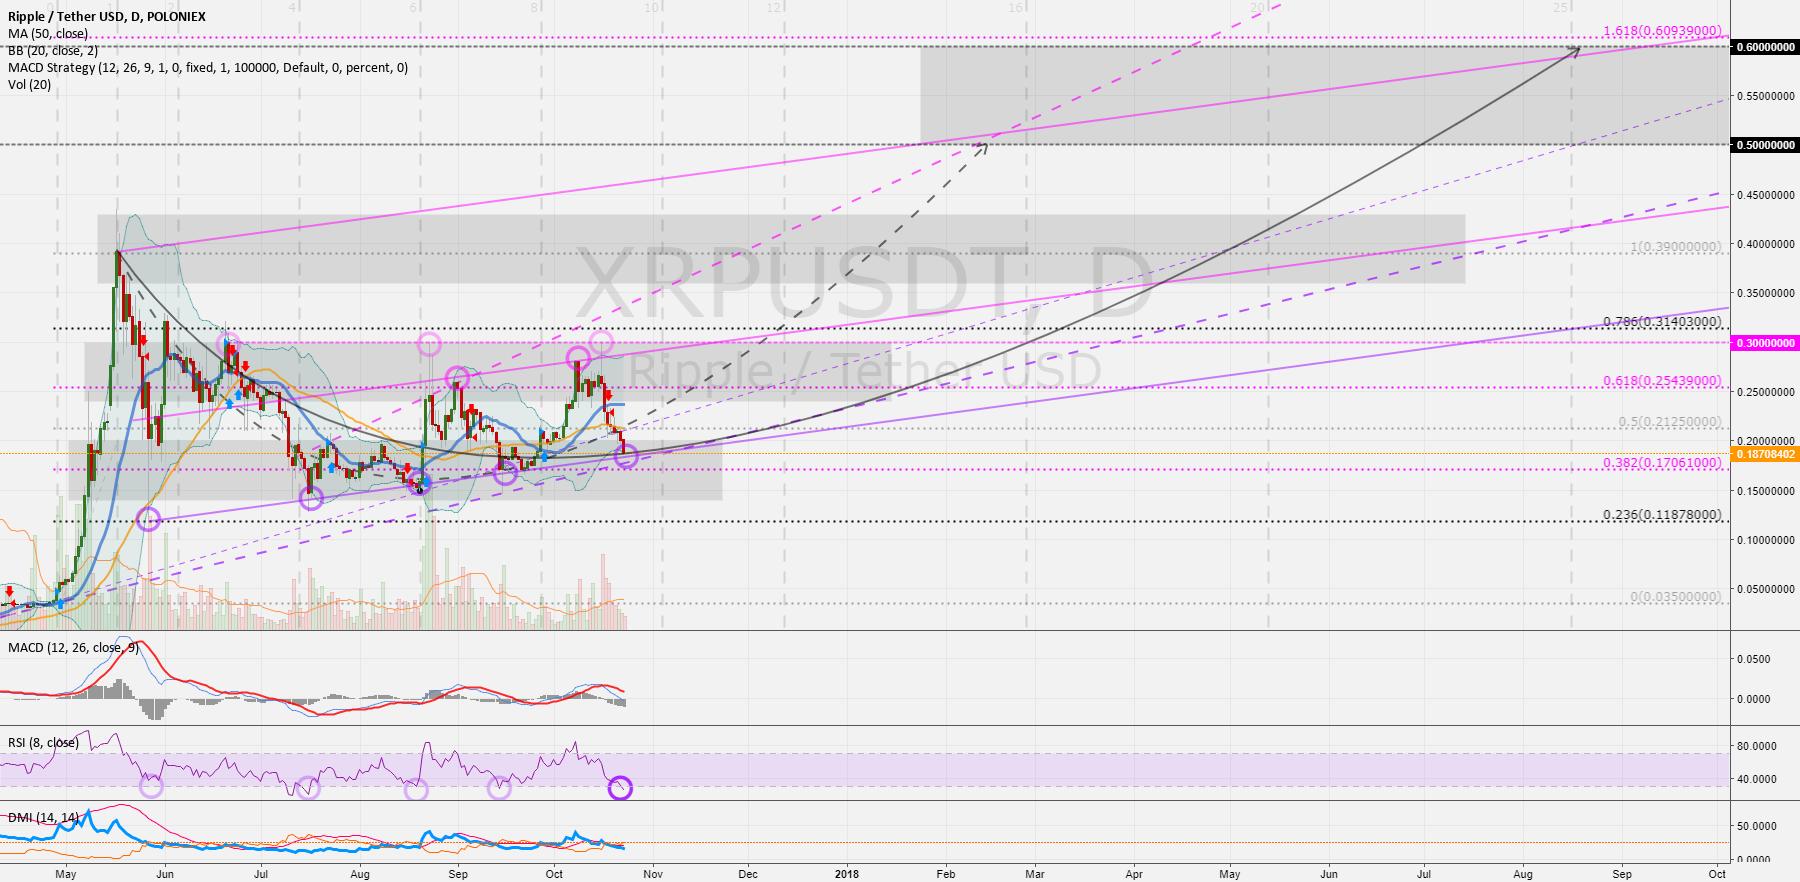 XRPUSD - RippleUSD (1D): The next upswing could be  > 0.3 USD